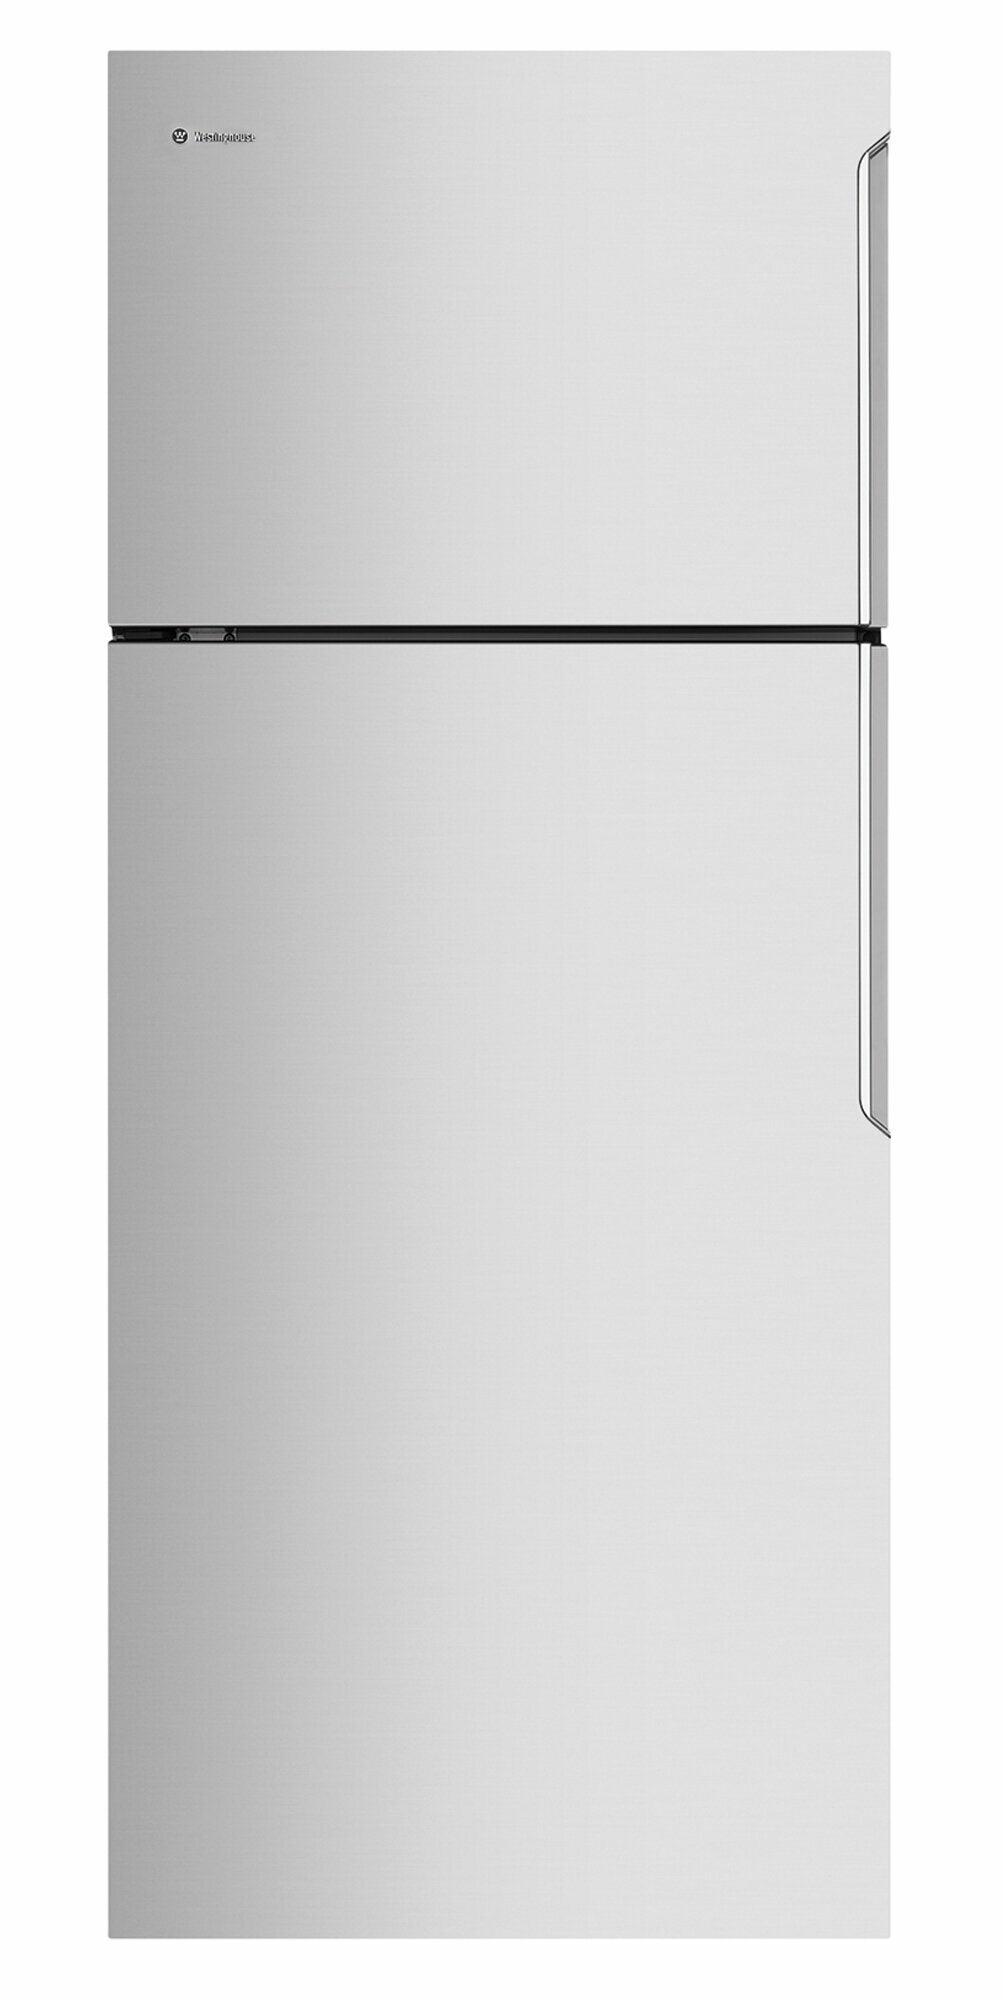 Westinghouse WTB4600SC-L Refrigerator